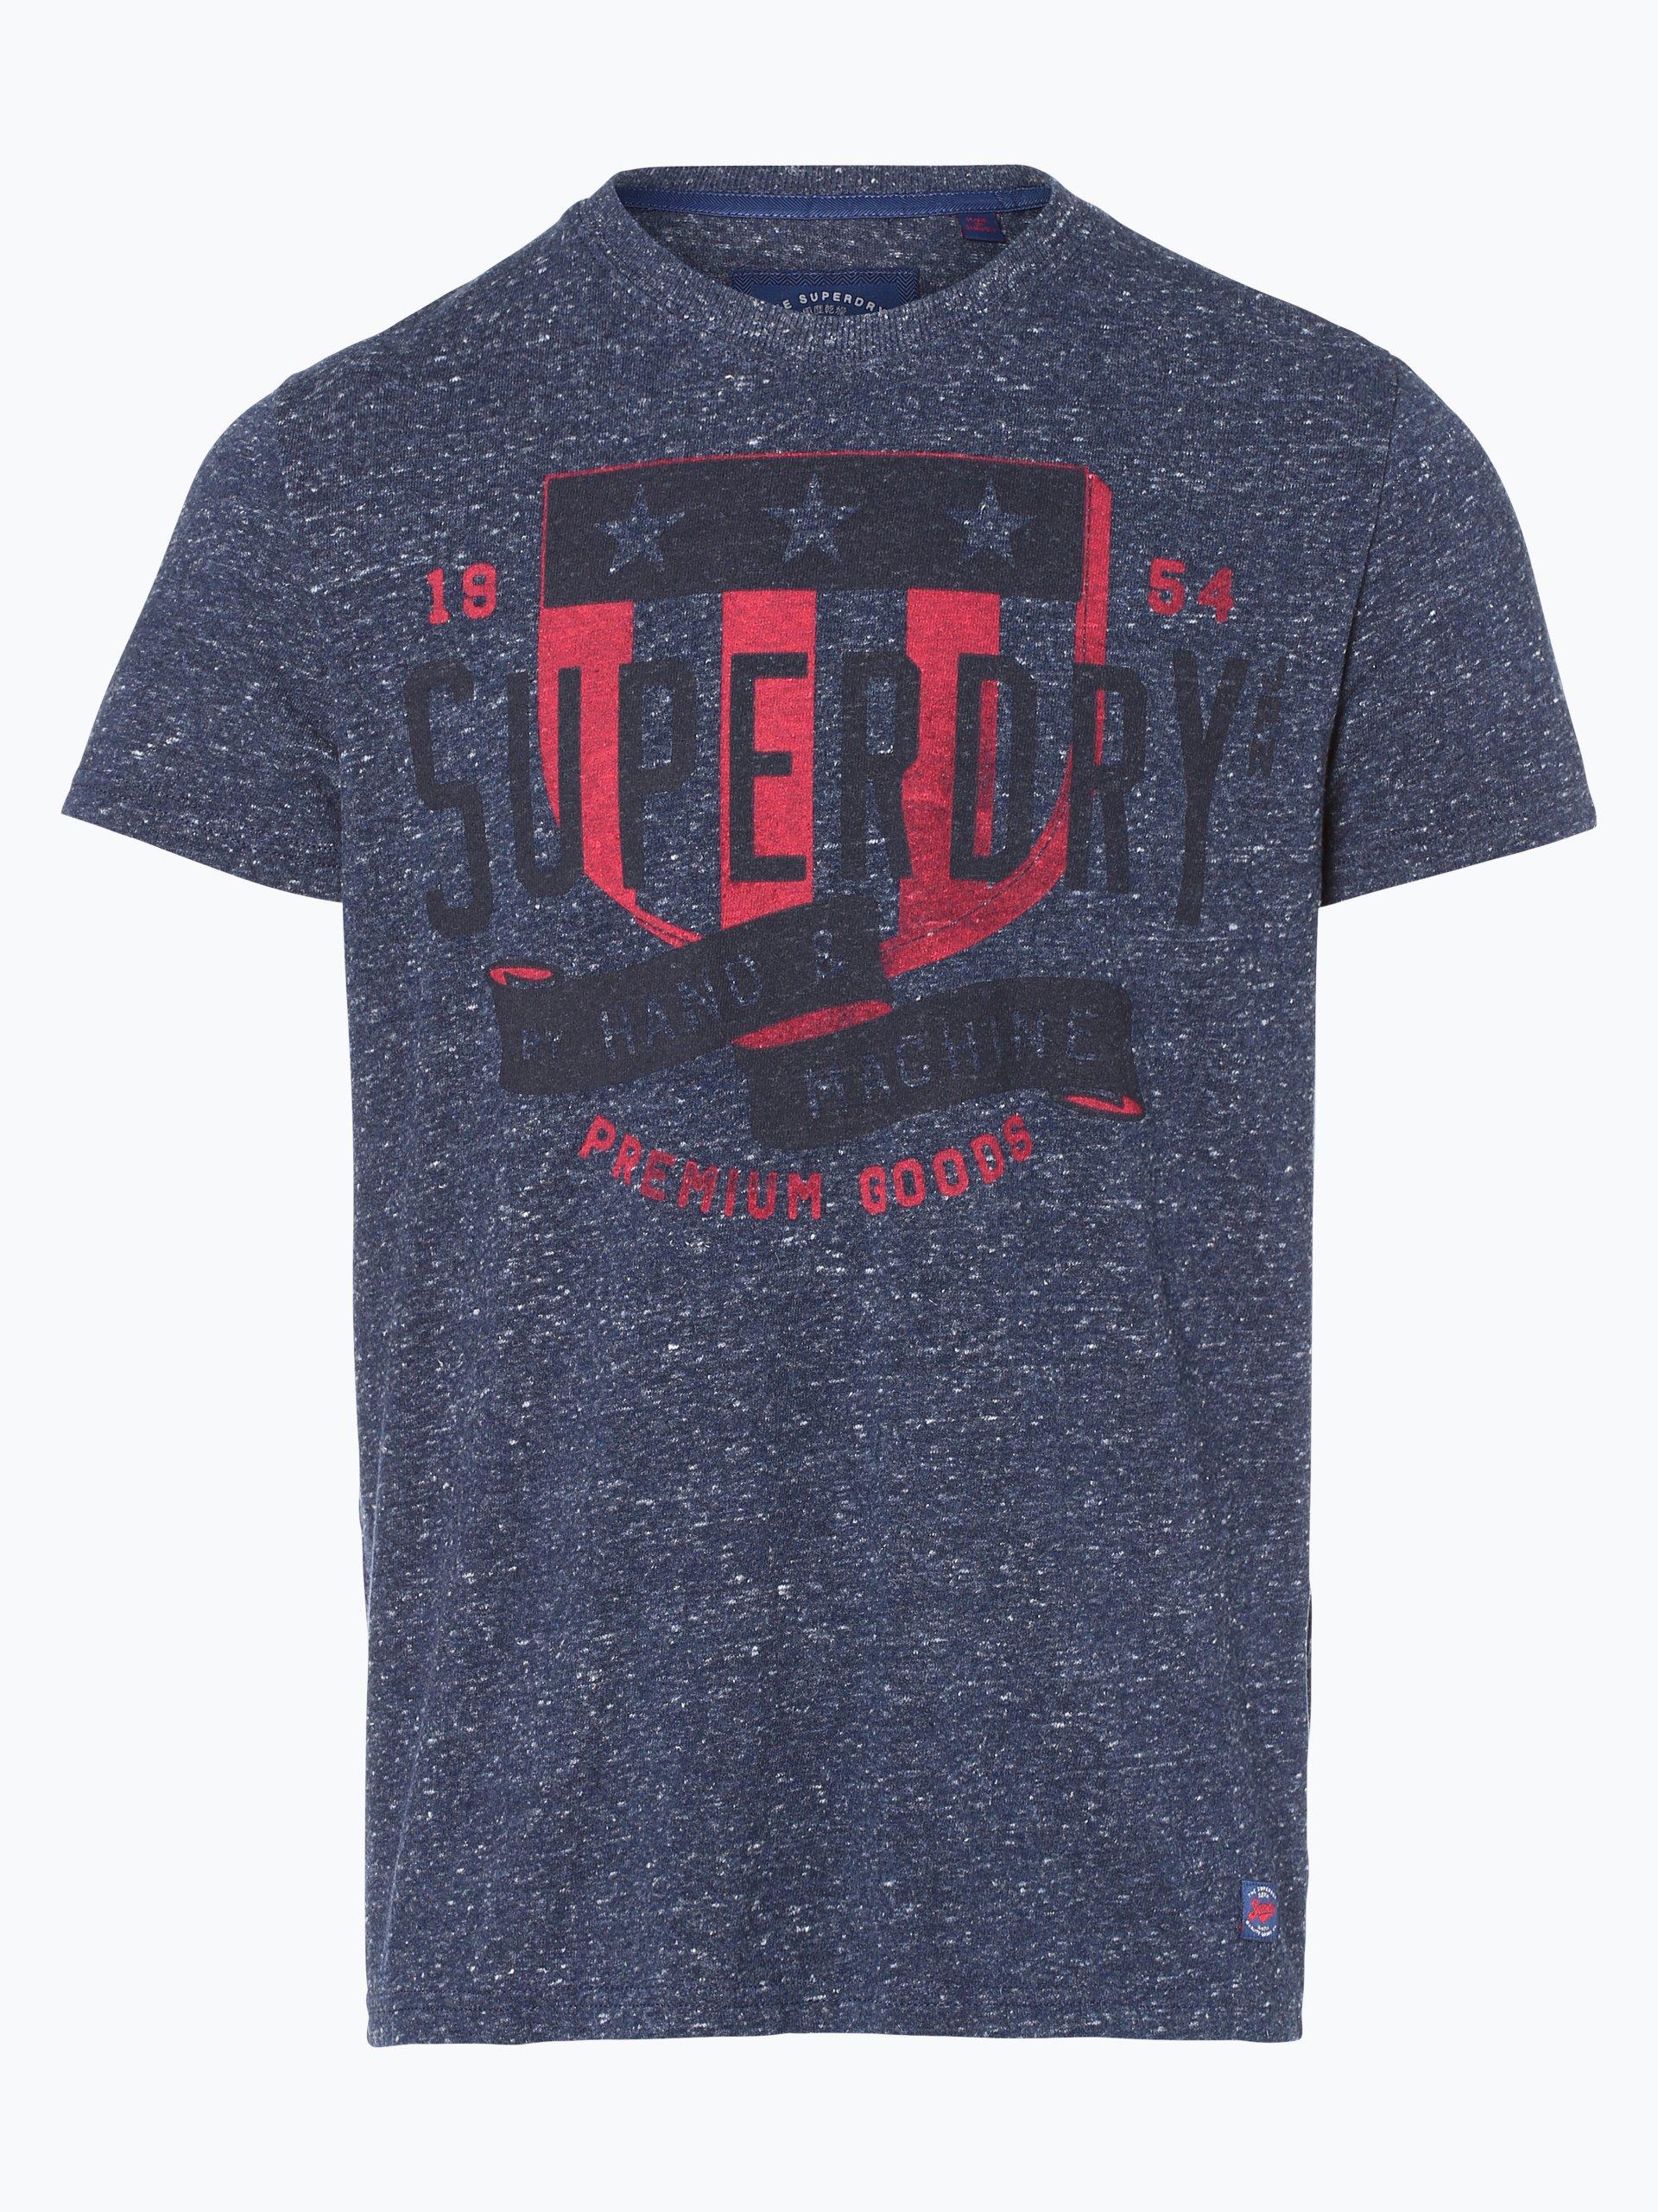 superdry herren t shirt marine uni online kaufen vangraaf com. Black Bedroom Furniture Sets. Home Design Ideas